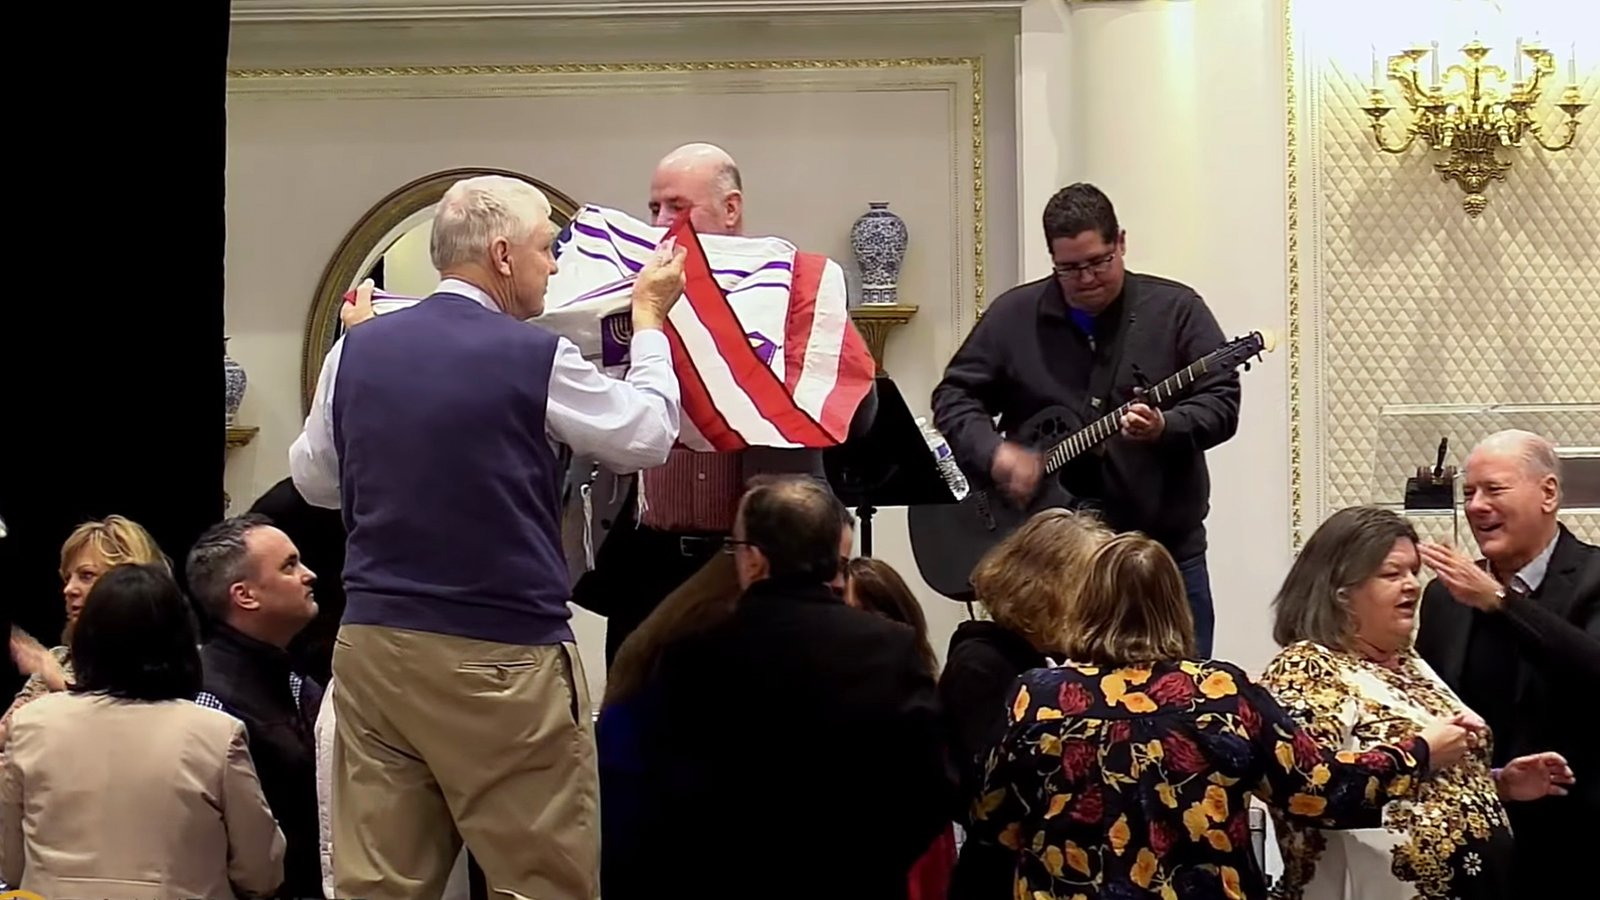 At Trump's hotel, spiritual warriors pray for the president Trump